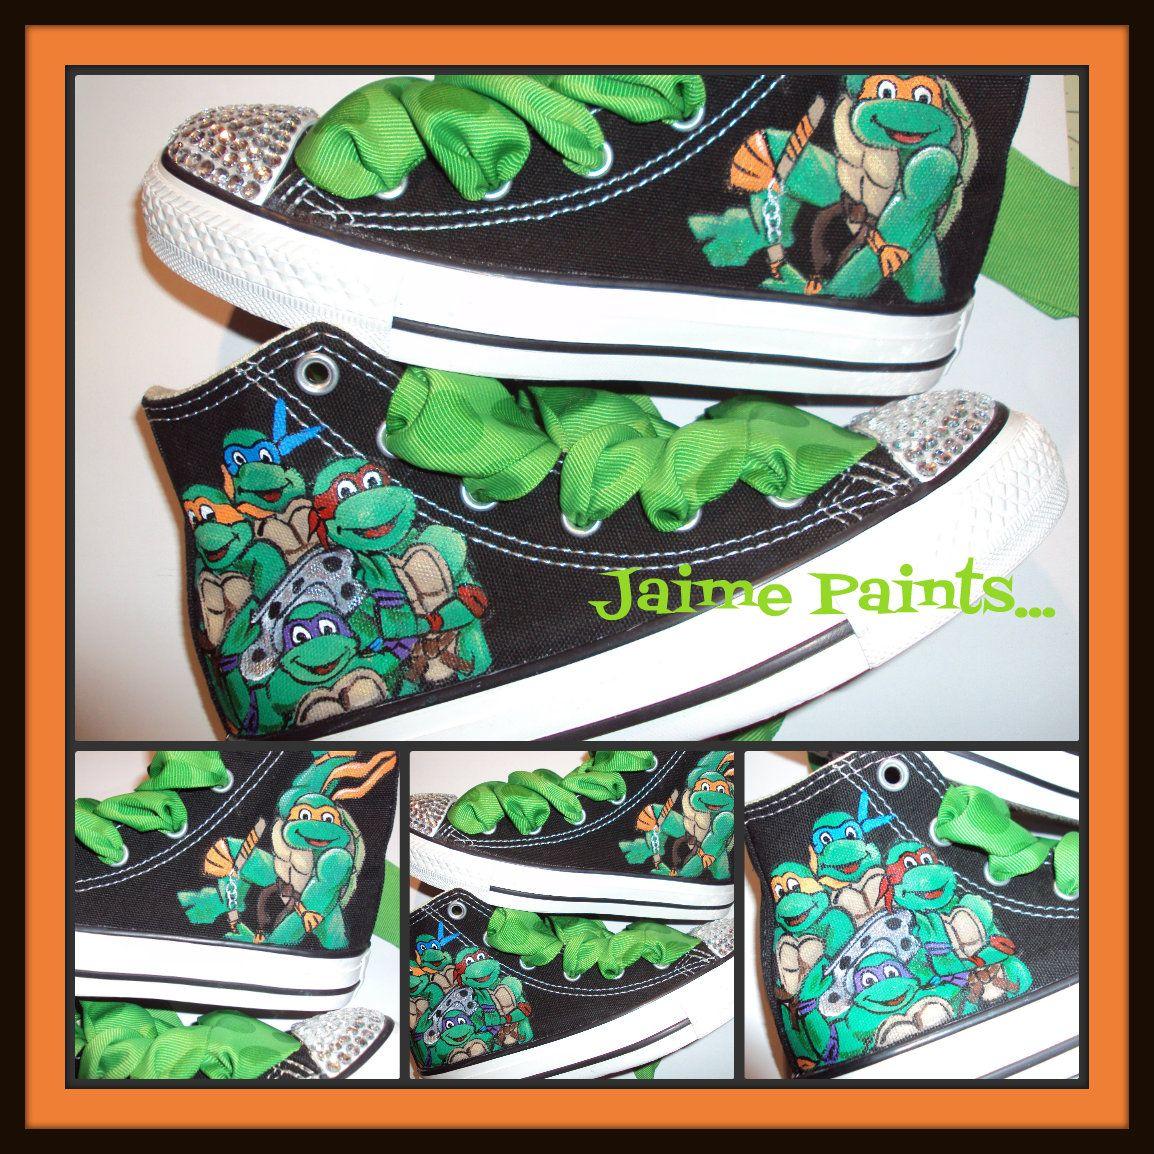 89d7e0b64756 TMNT Girls love Teenage Mutant Ninja Turtles TOO!!! Hand painted TMNT  Converse with bling